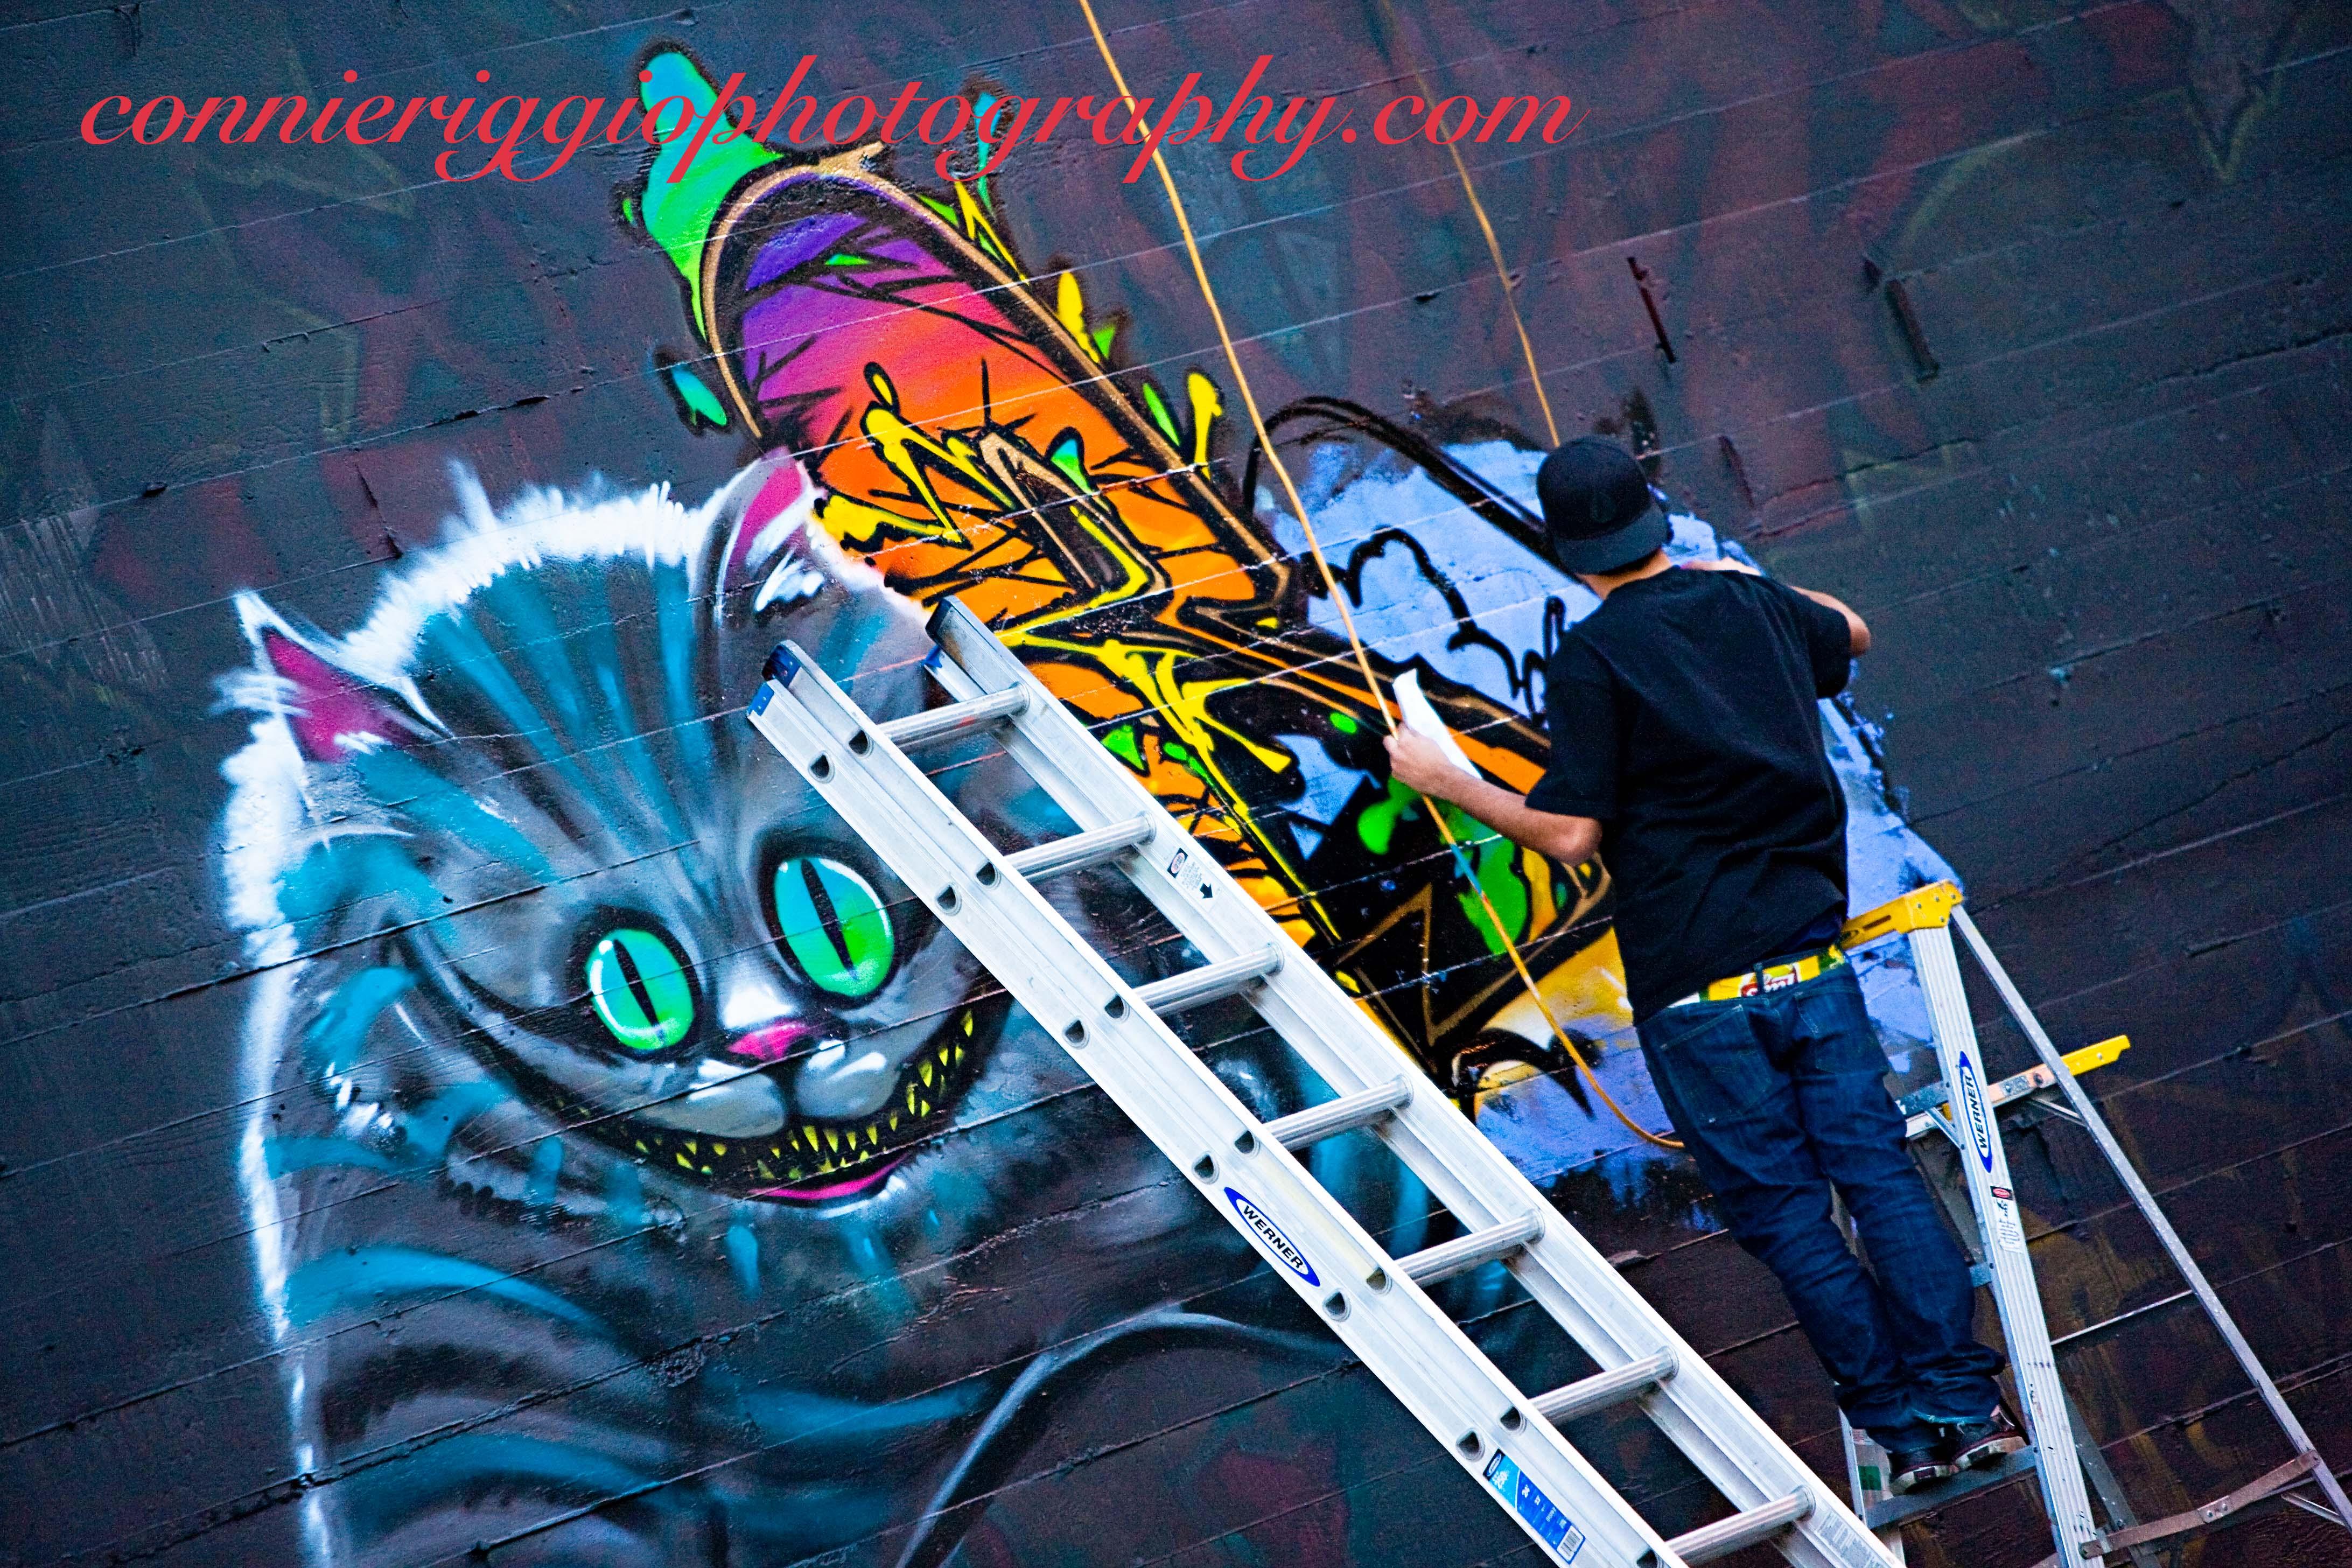 Graffiti wall tacoma - Market Street Graffiti Wall